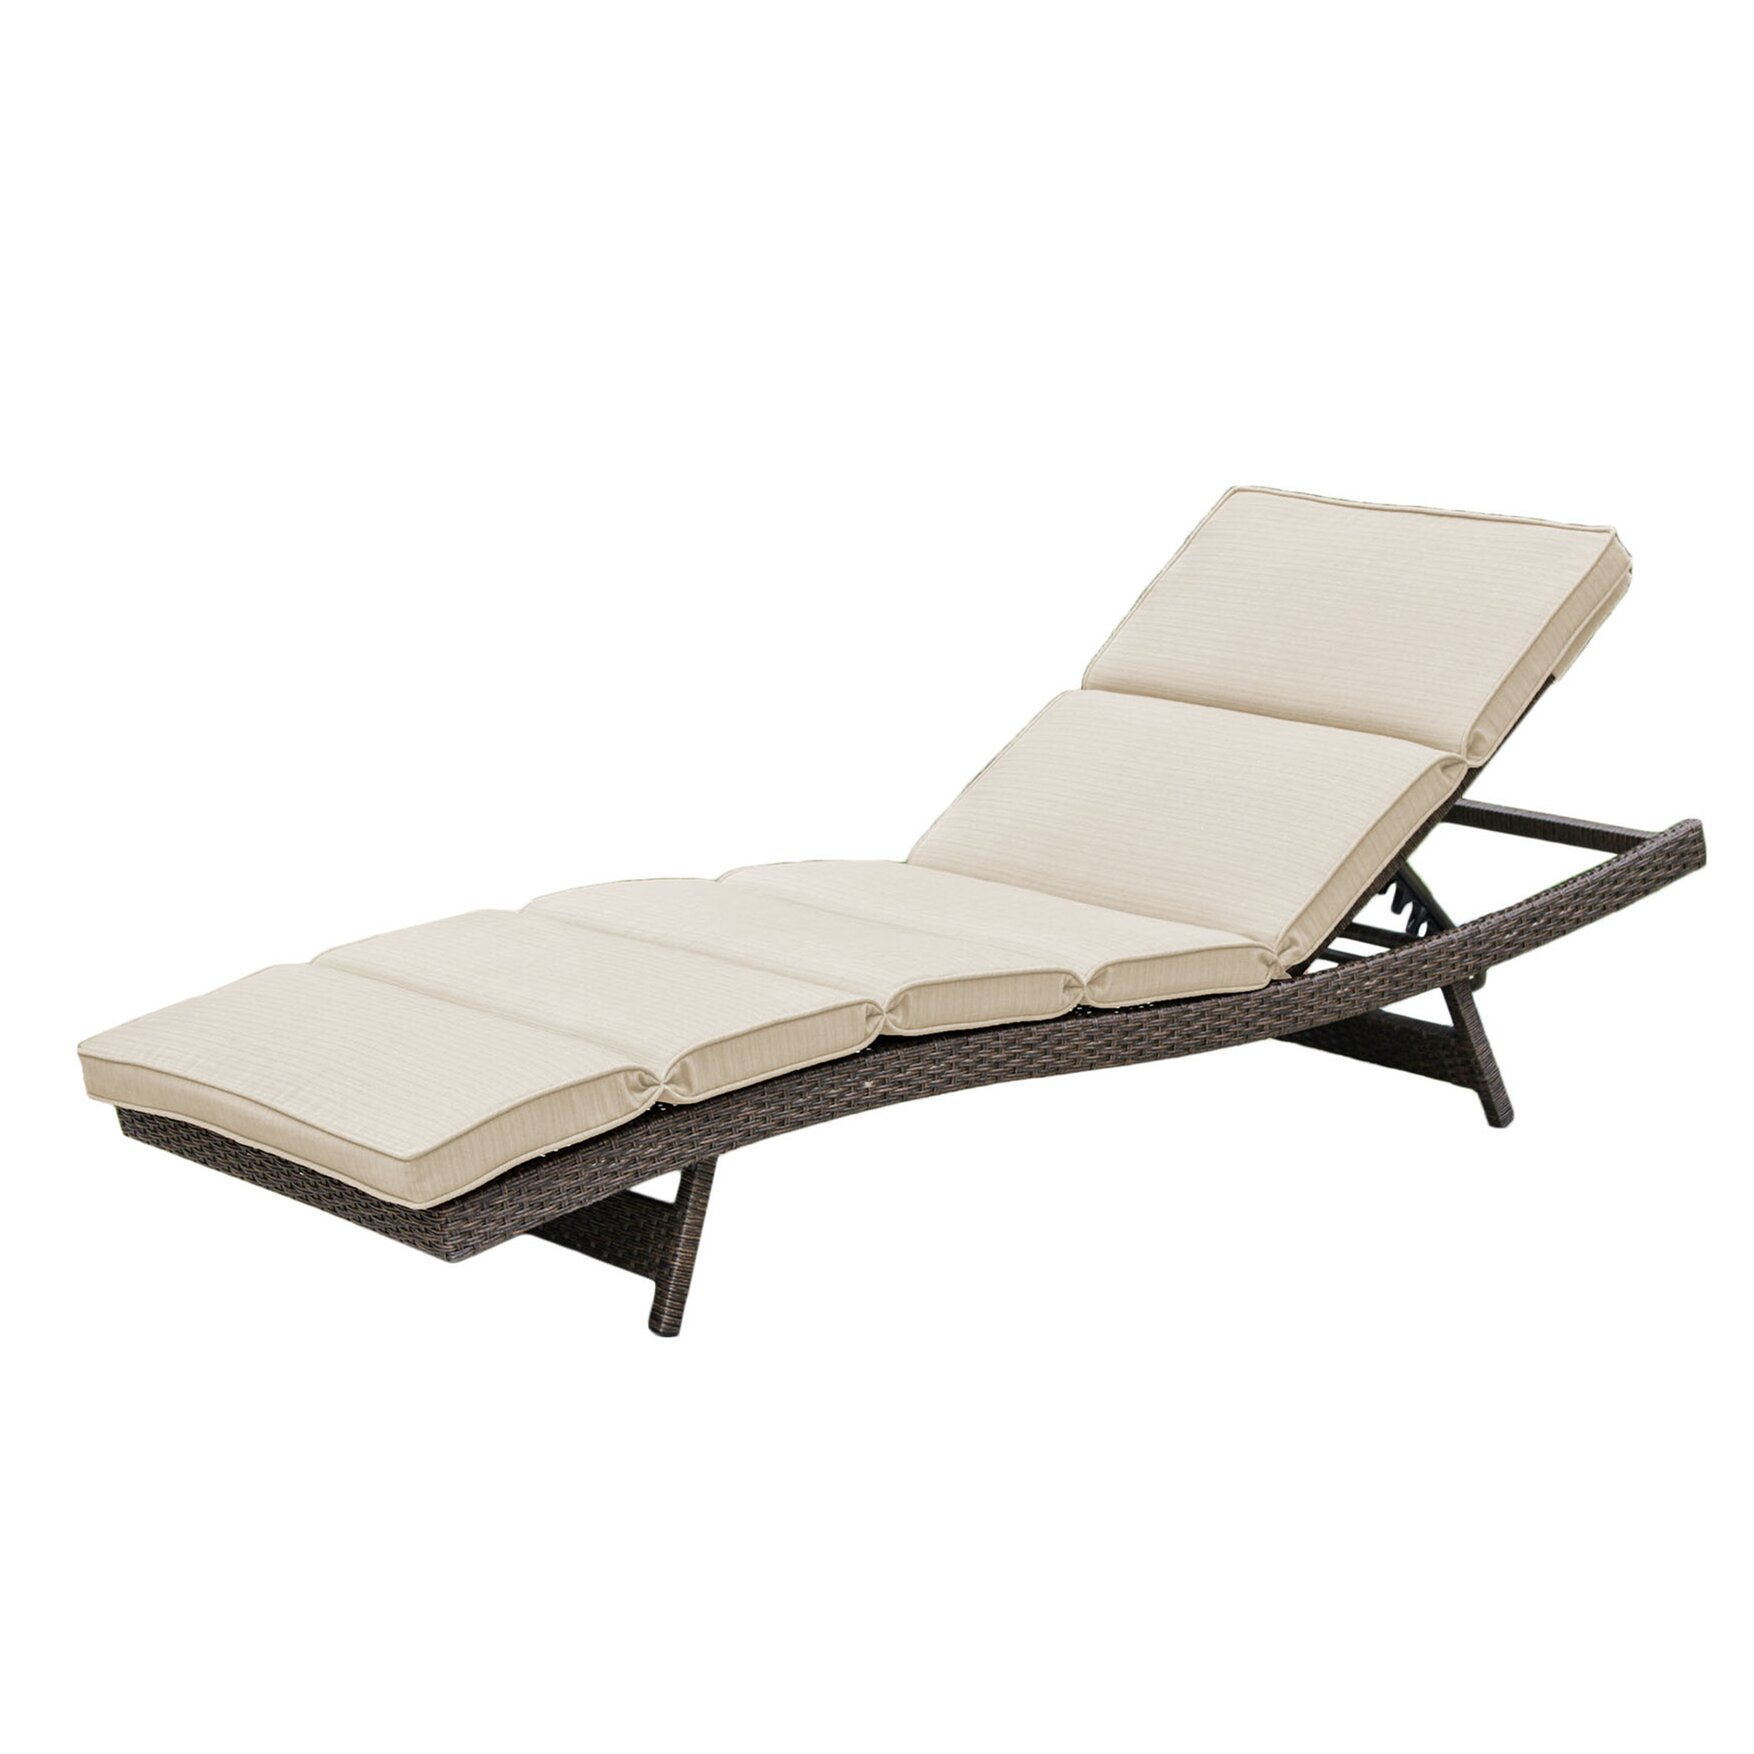 Brayden studio fortenberry chaise lounge with cushion for Buy chaise lounge cushion